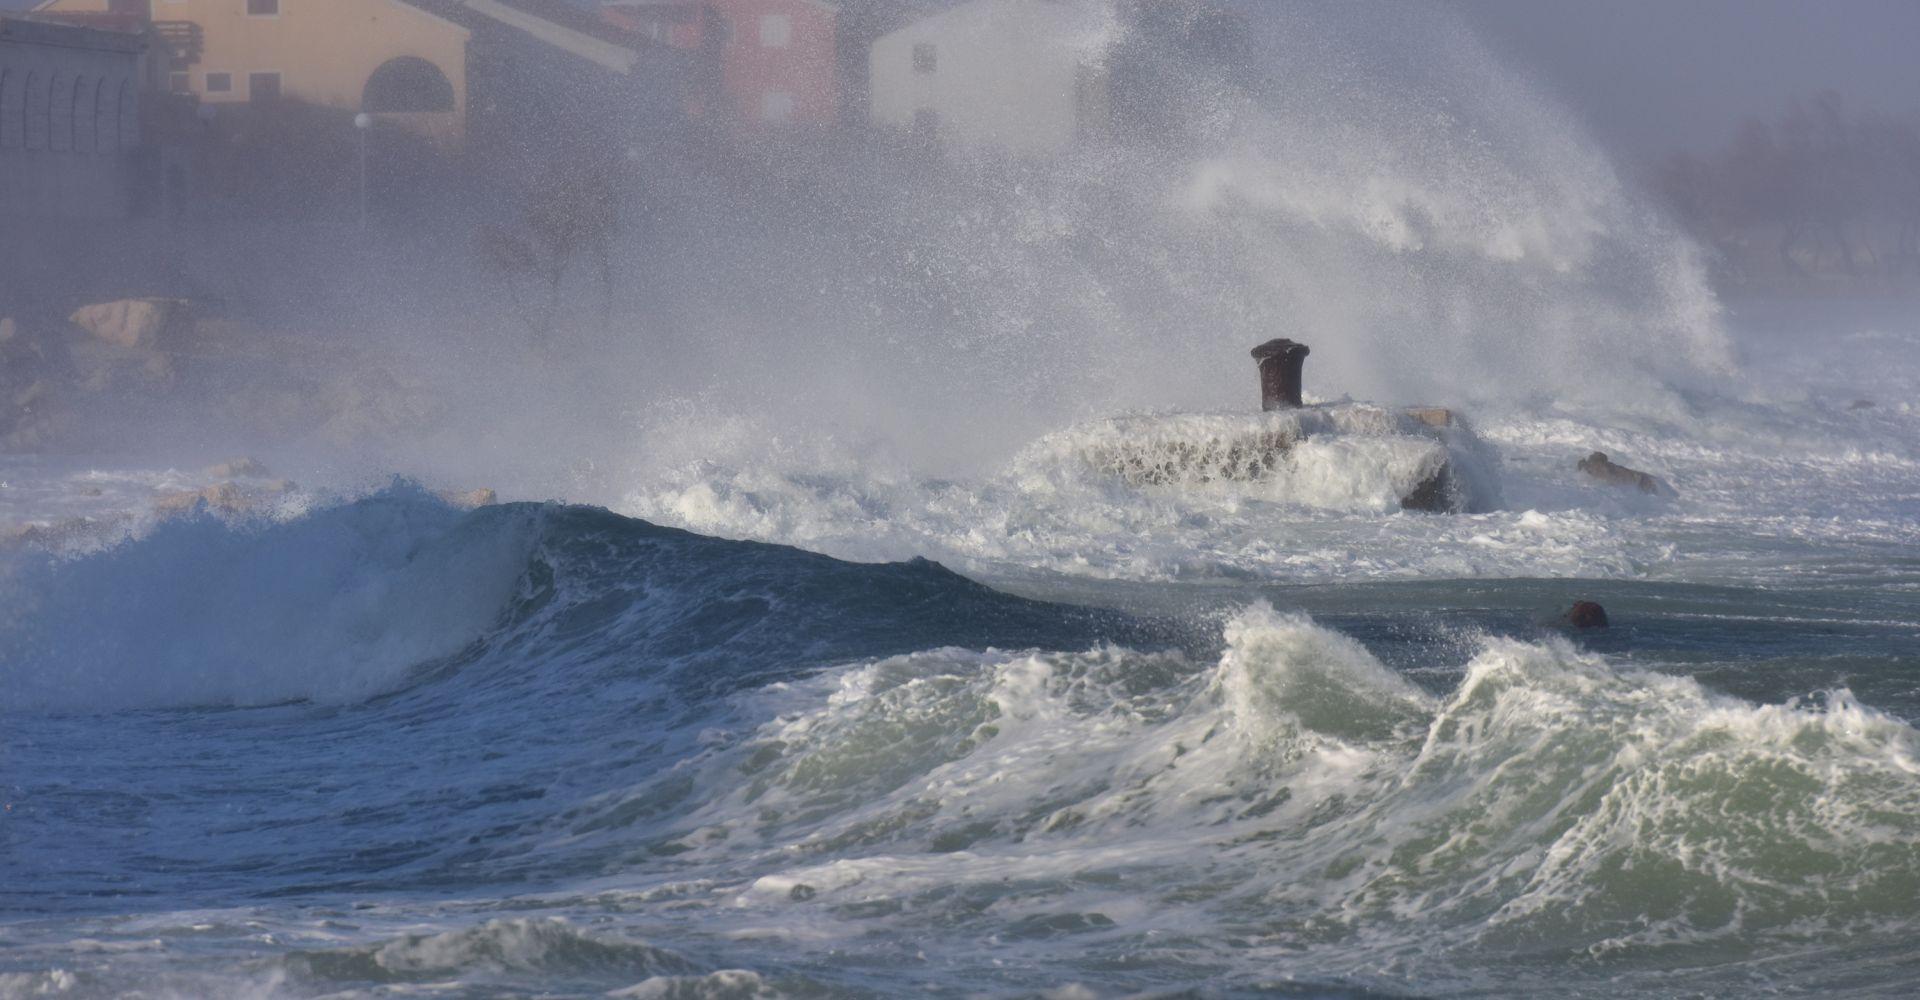 HAK Kolnici skliski i mokri, olujni vjetar otežava cestovni i pomorski promet